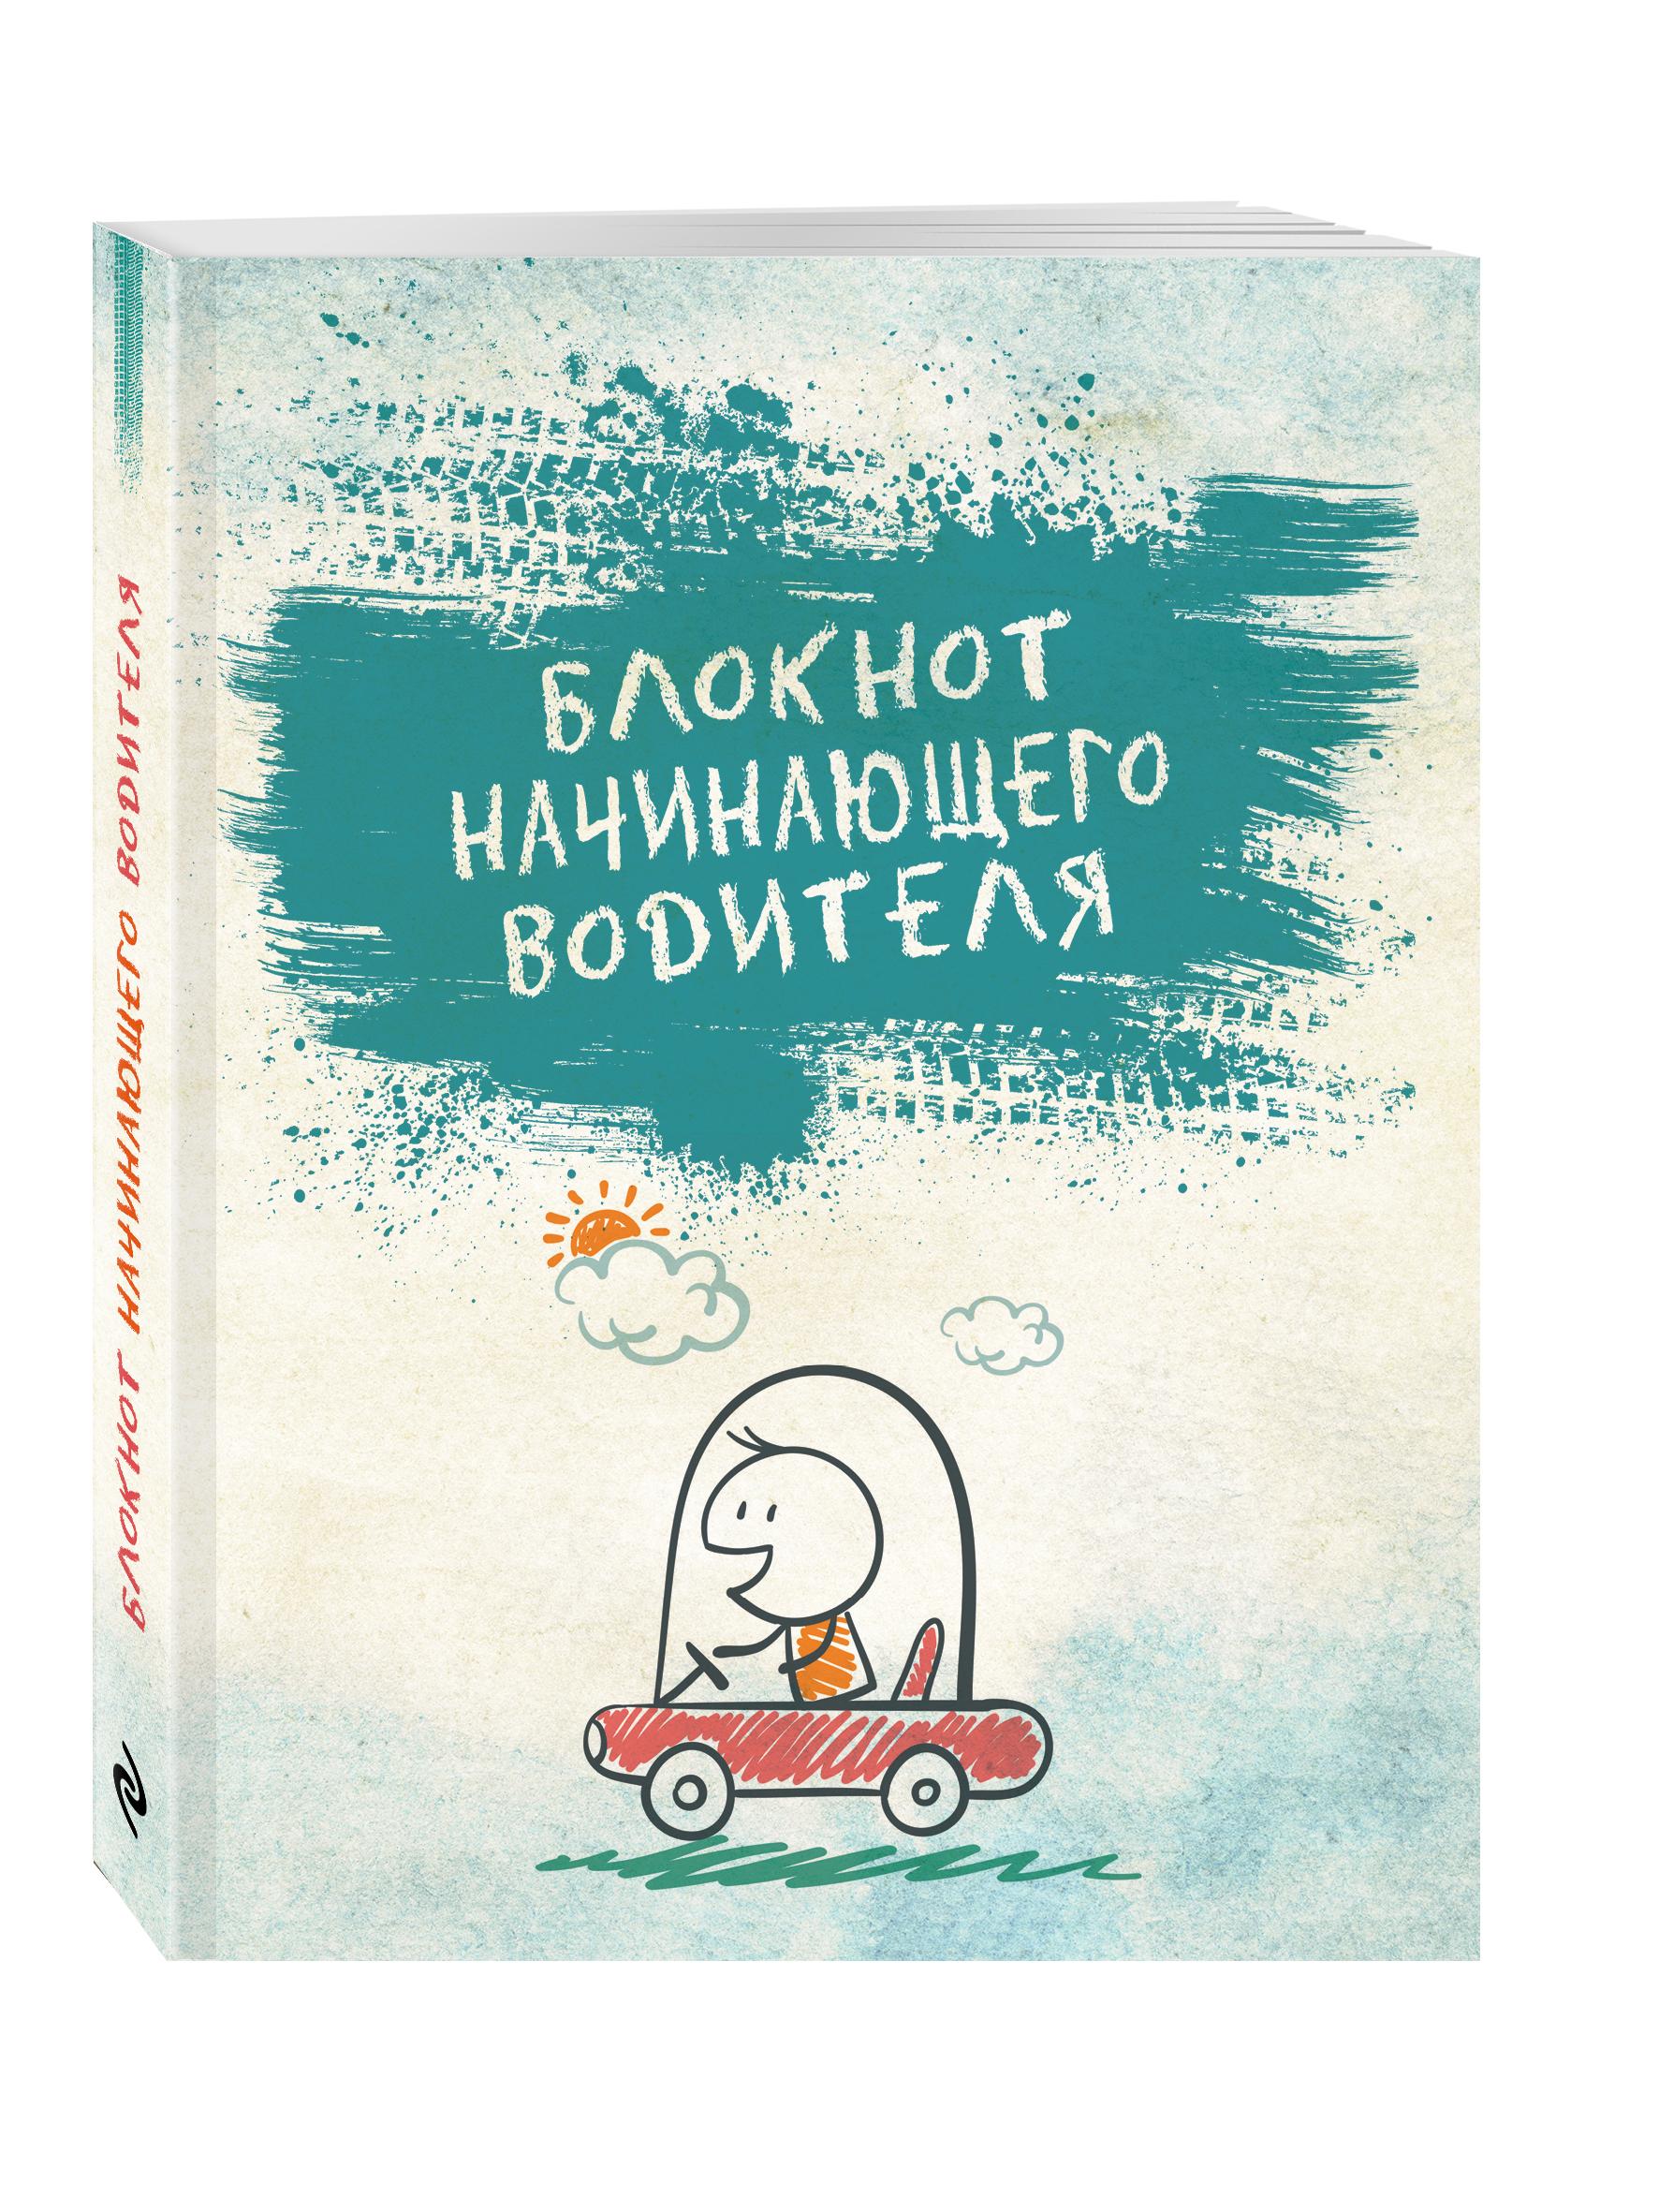 Блокнот начинающего водителя holika holika тоник для лица holika holika skin and good cera ultra toner